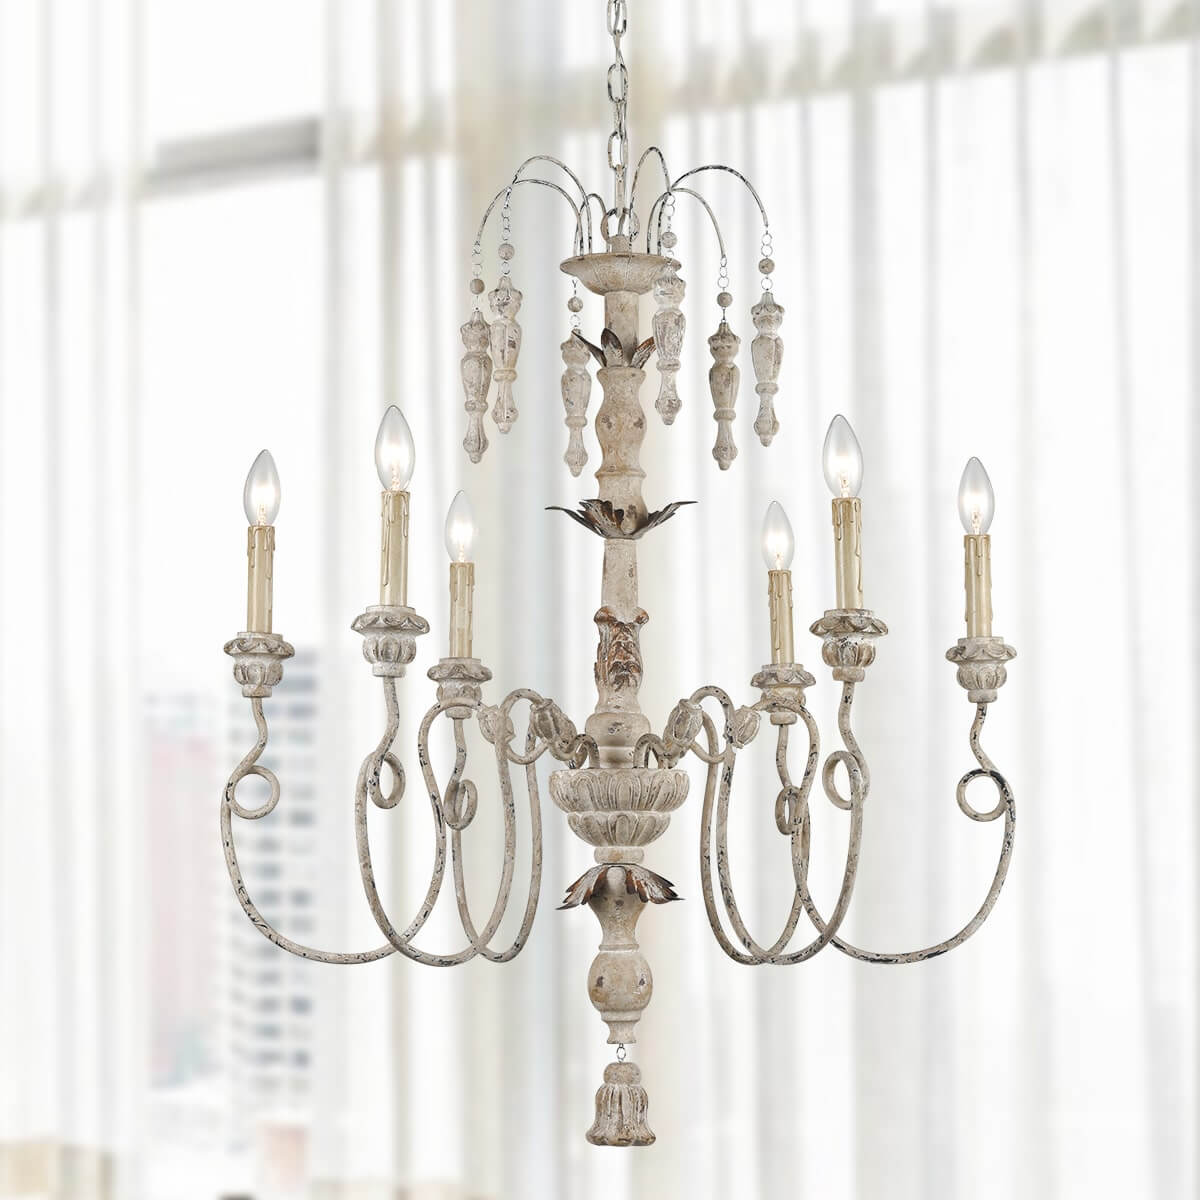 6 Light Farmhouse Chandelier White Washed Wooden Pendants Lighting